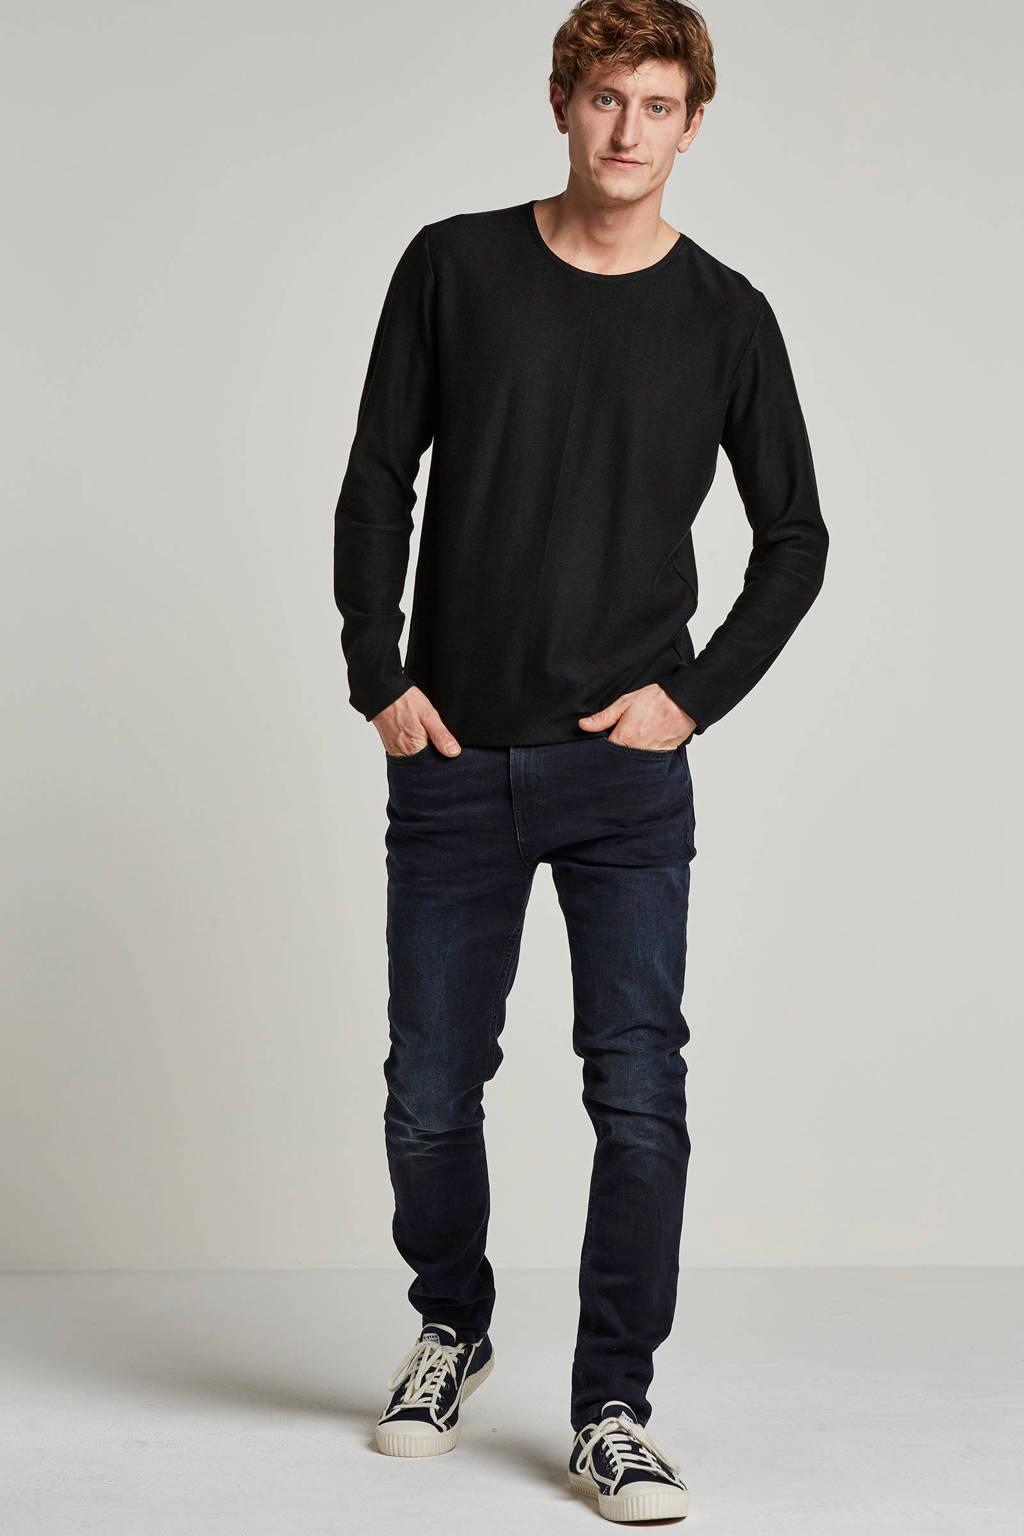 REPLAY trui, Zwart